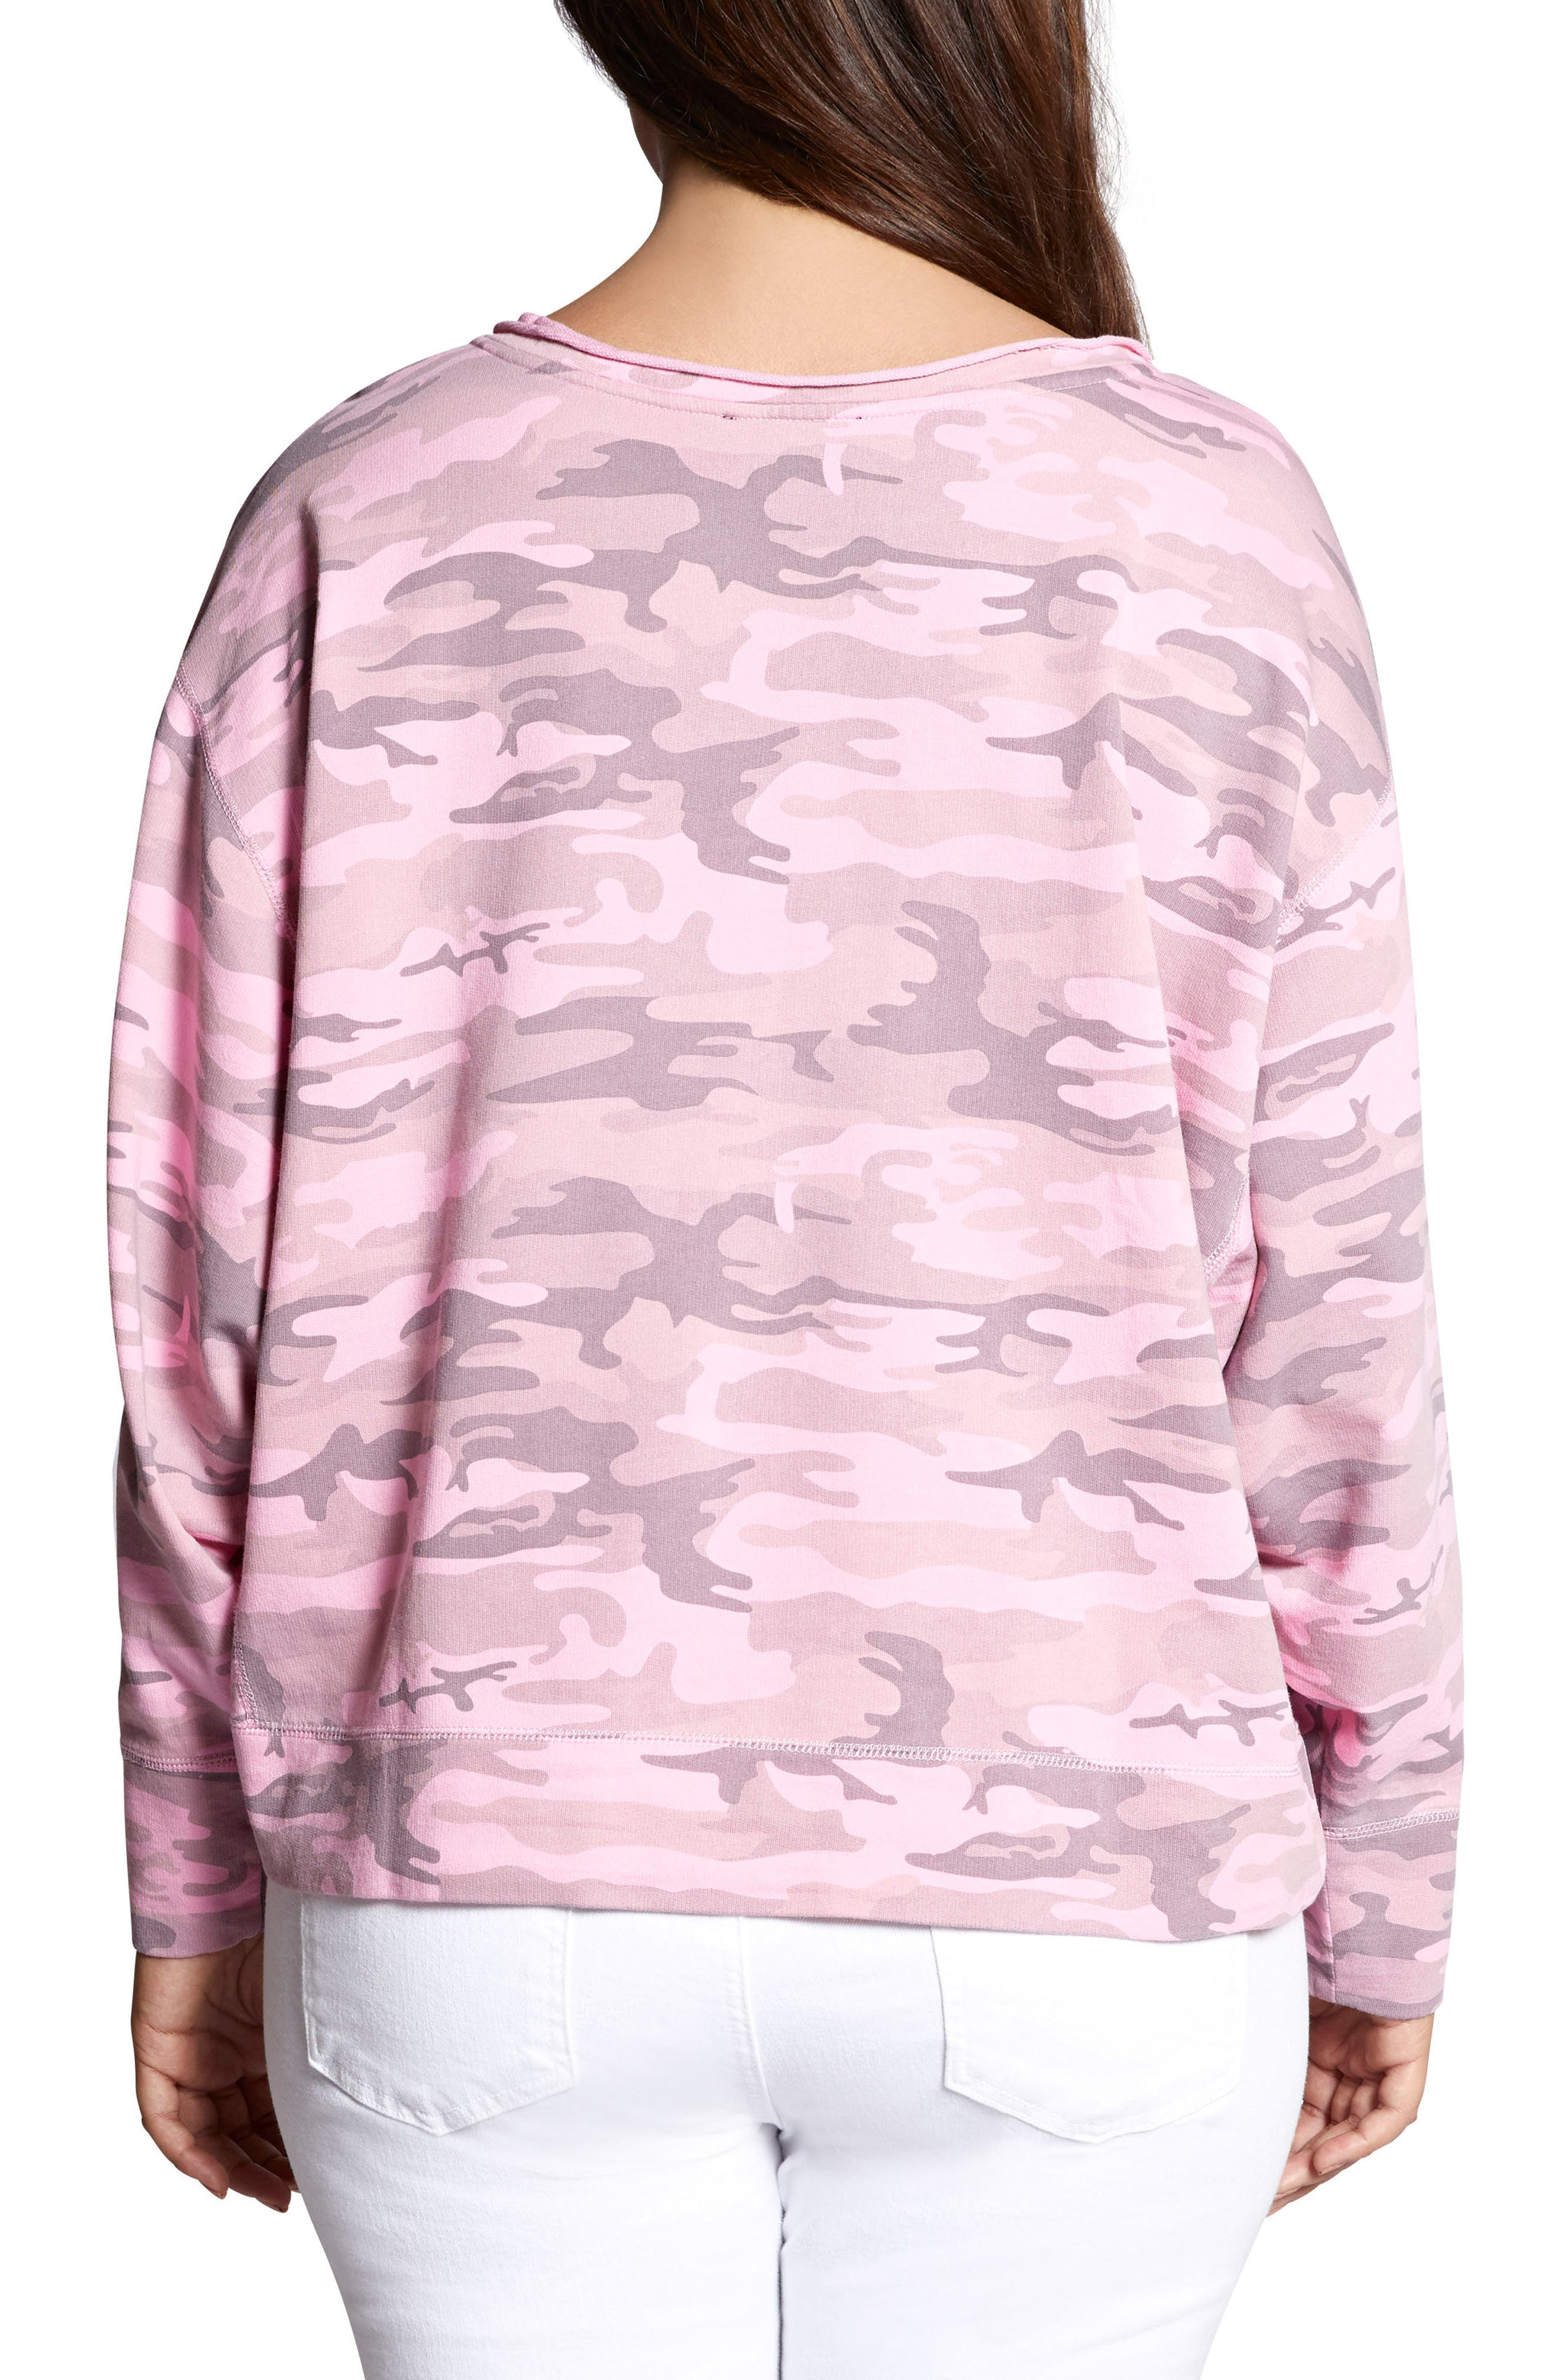 Breslin Split Neck Sweatshirt,                             Alternate thumbnail 3, color,                             Wild Cherry Camo